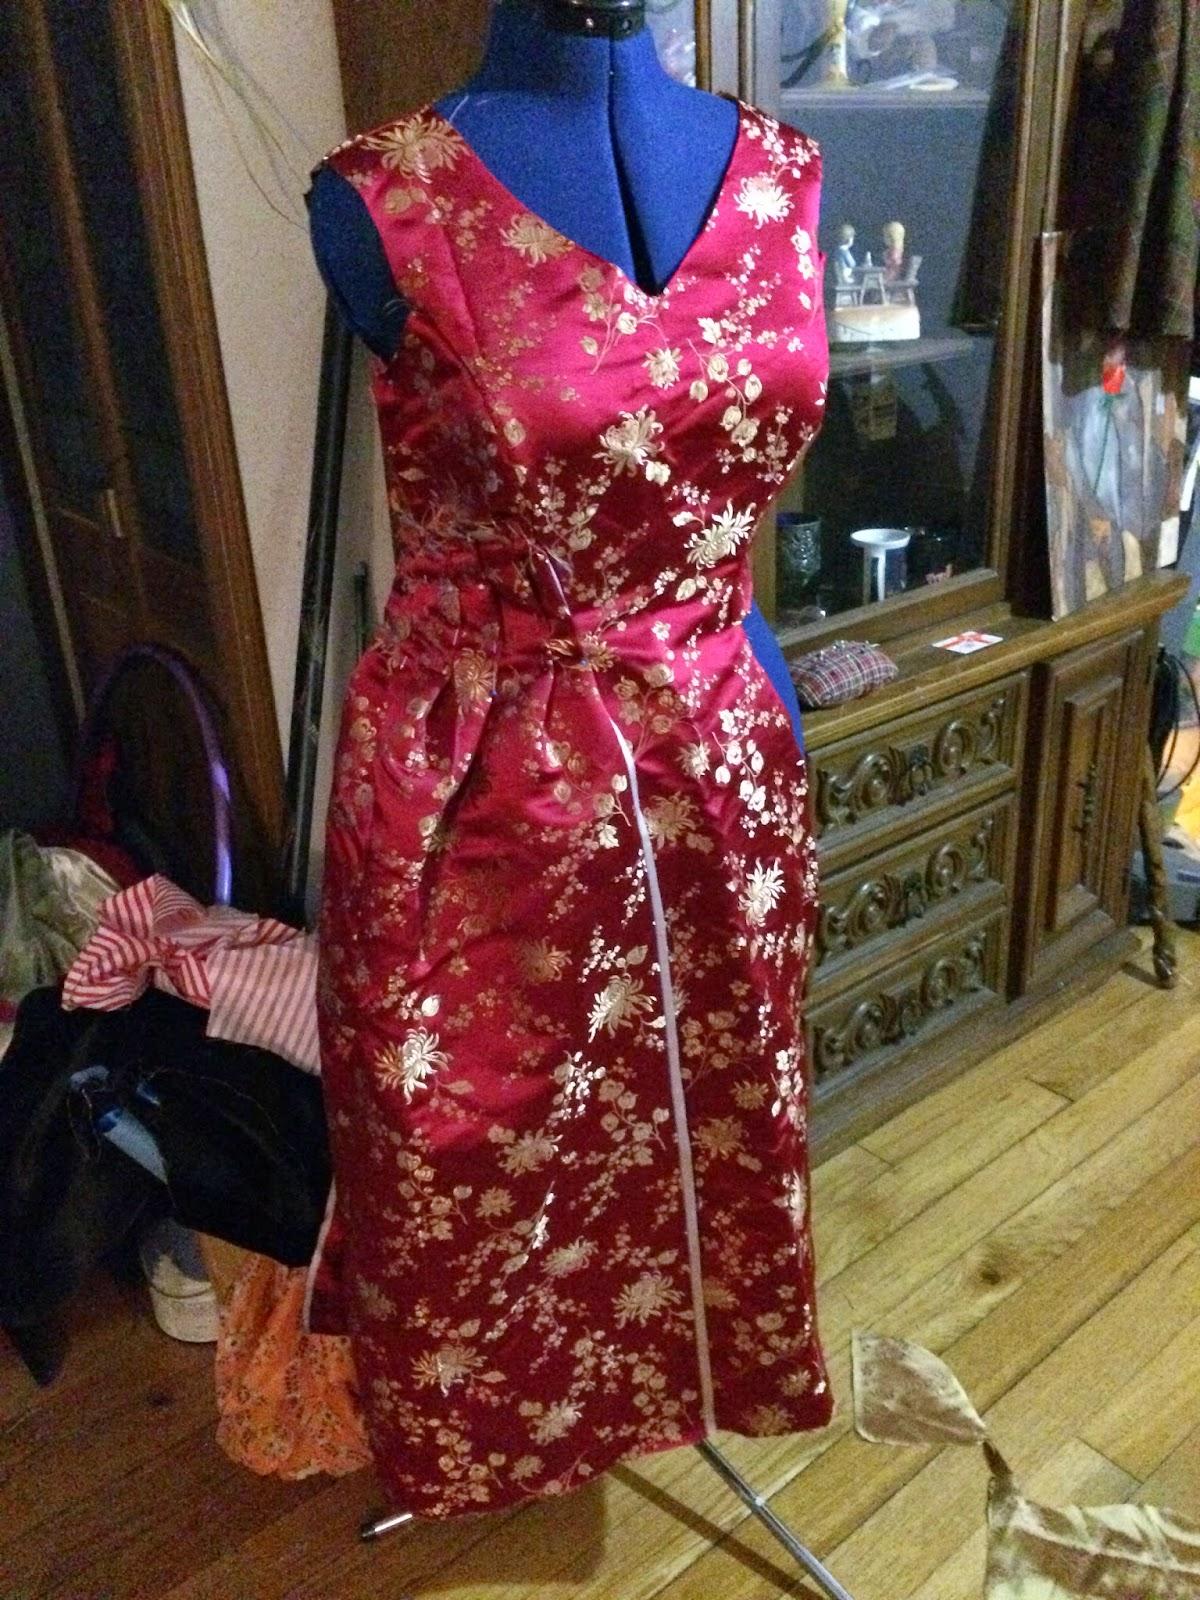 Company Christmas Party Dress.Company Christmas Party Dresses Dacc